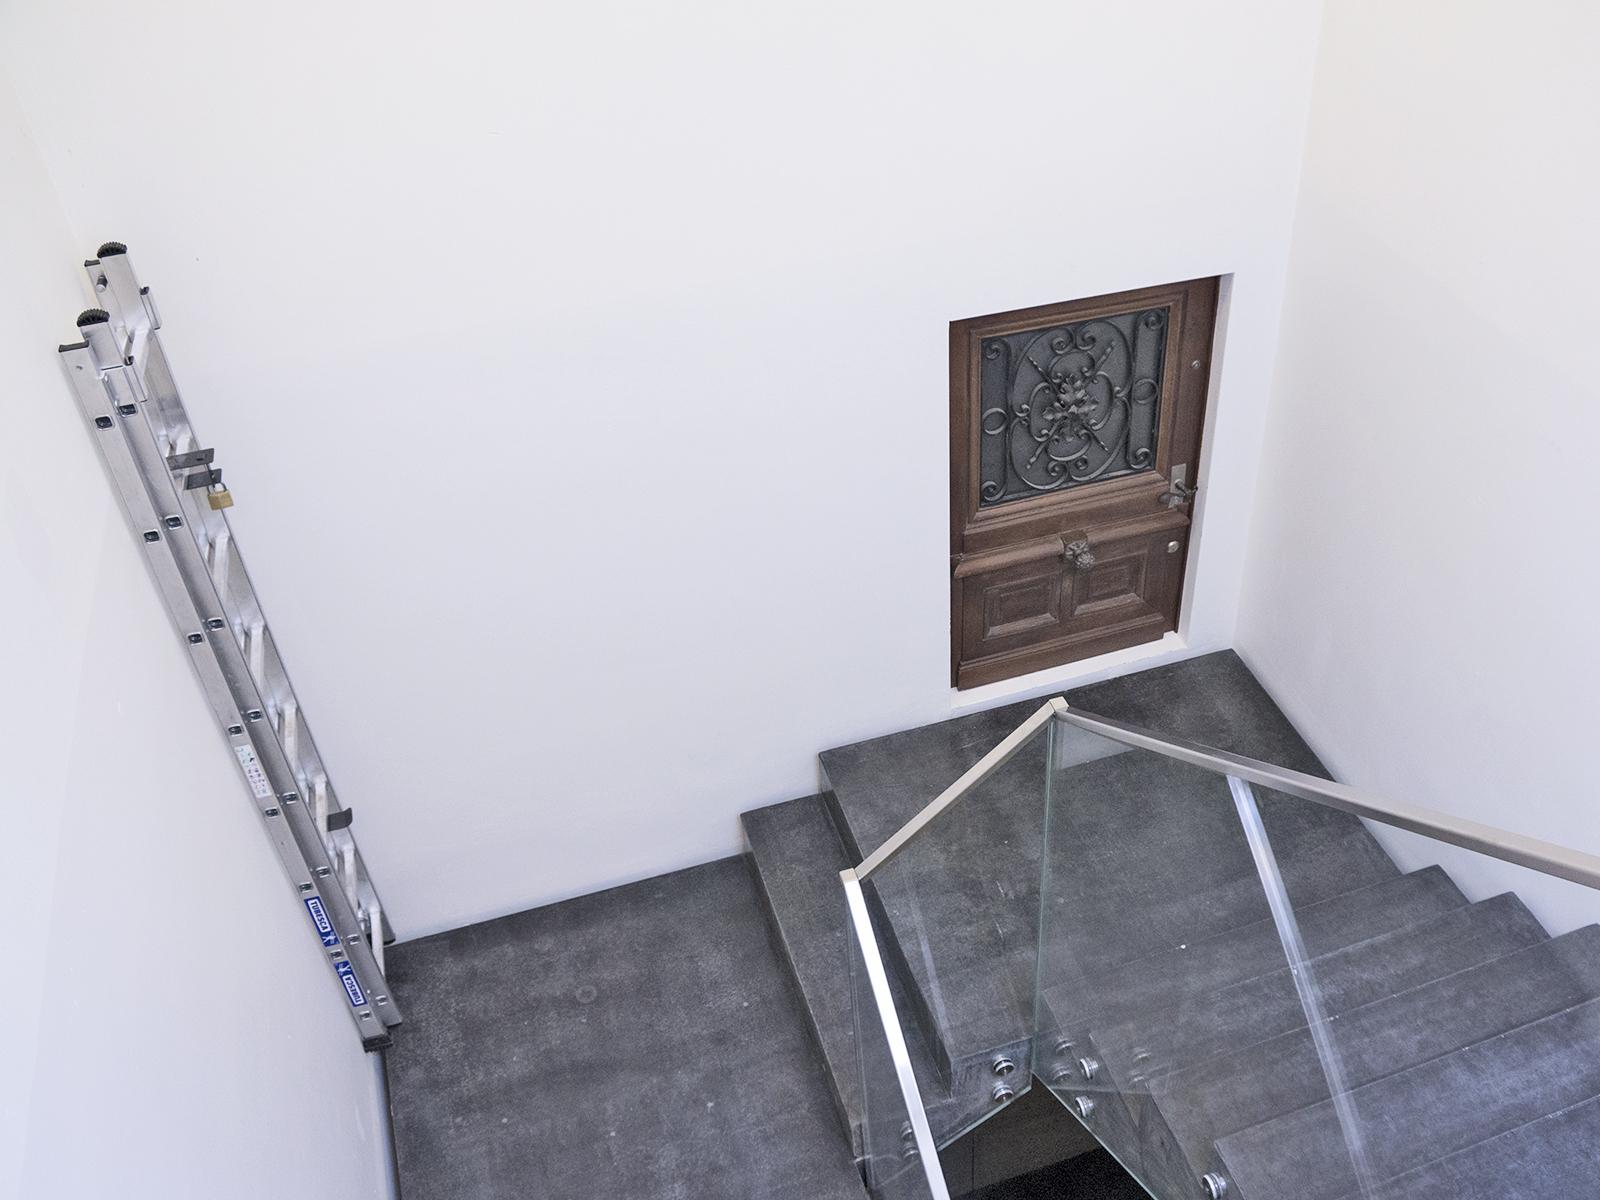 Benoit-Delaunay-artiste-sculptures-2011-Elapsed Time-06